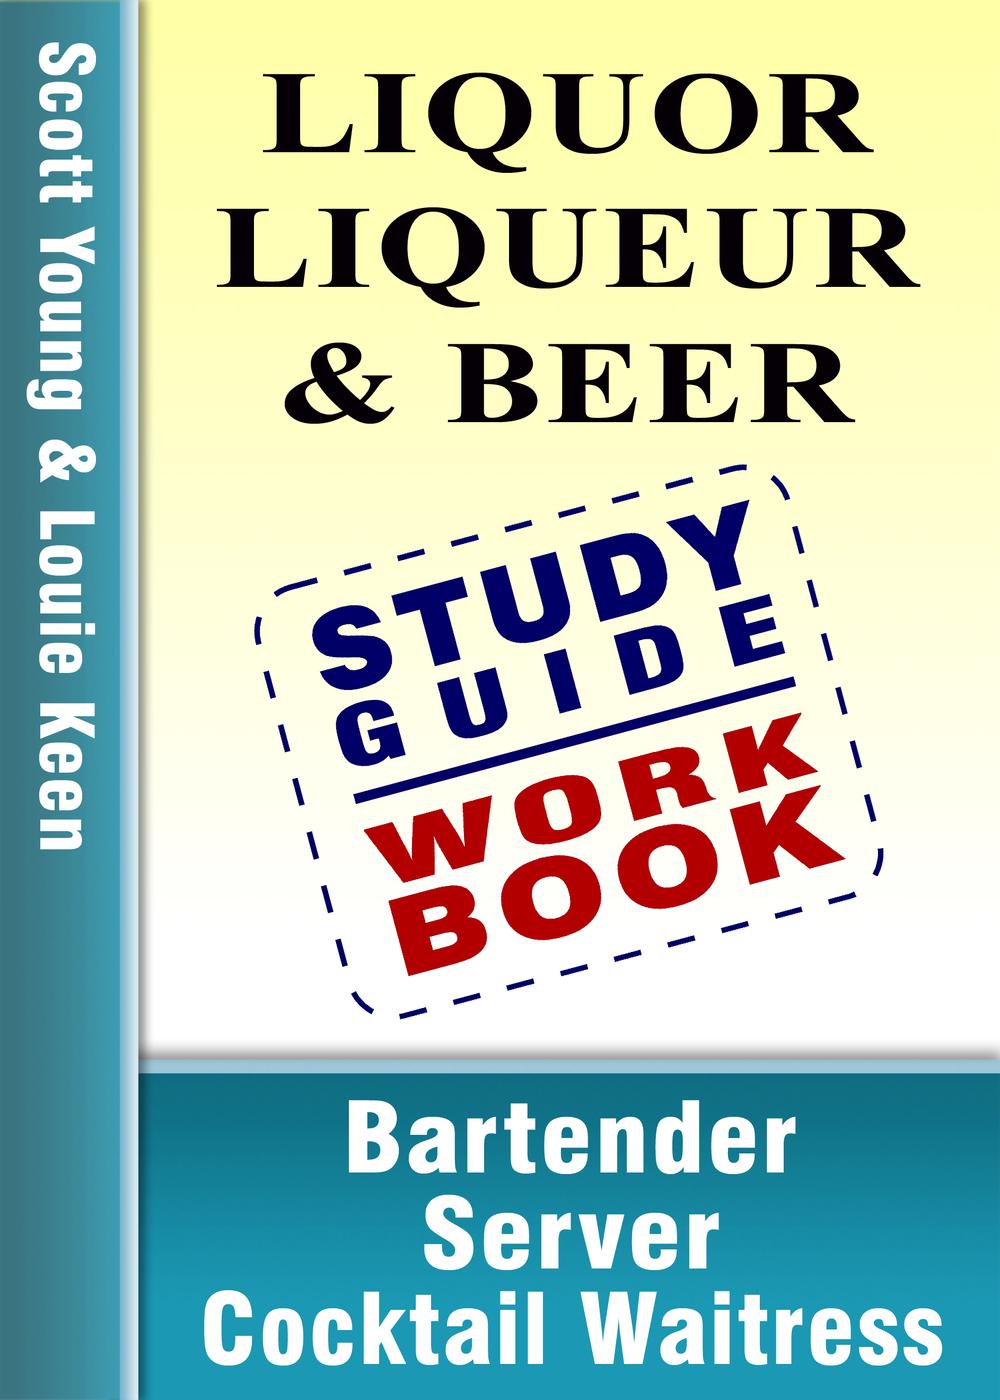 TWO L - B - STUDY - Large-1.jpg